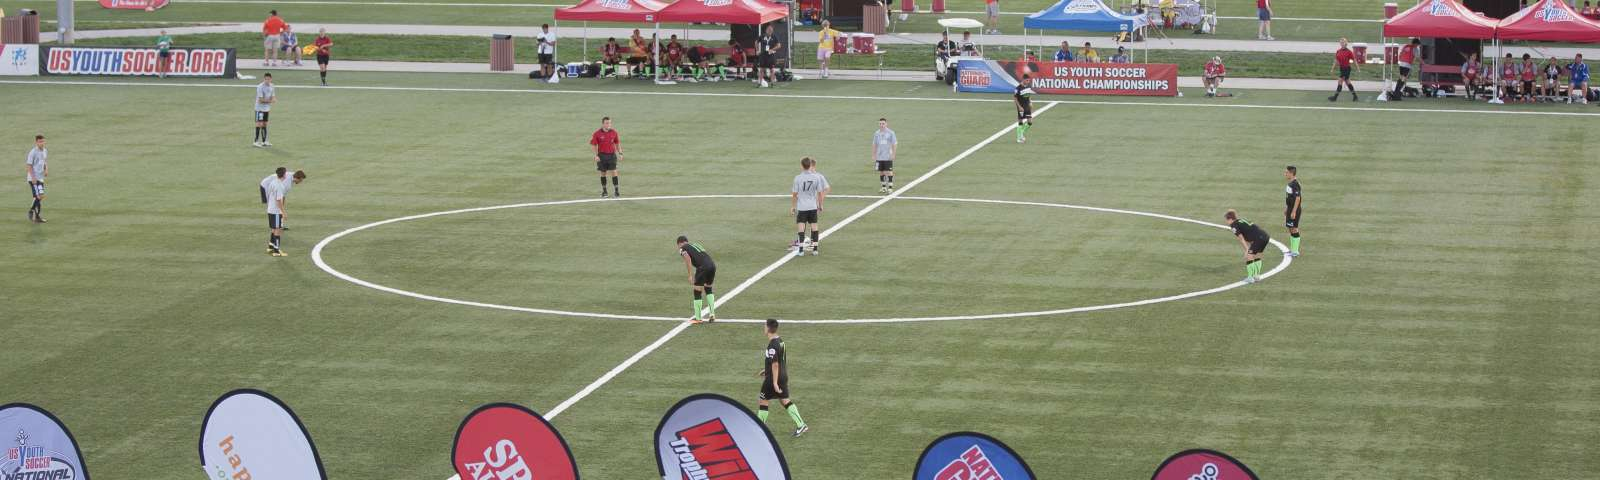 Overland Park Soccer Complex